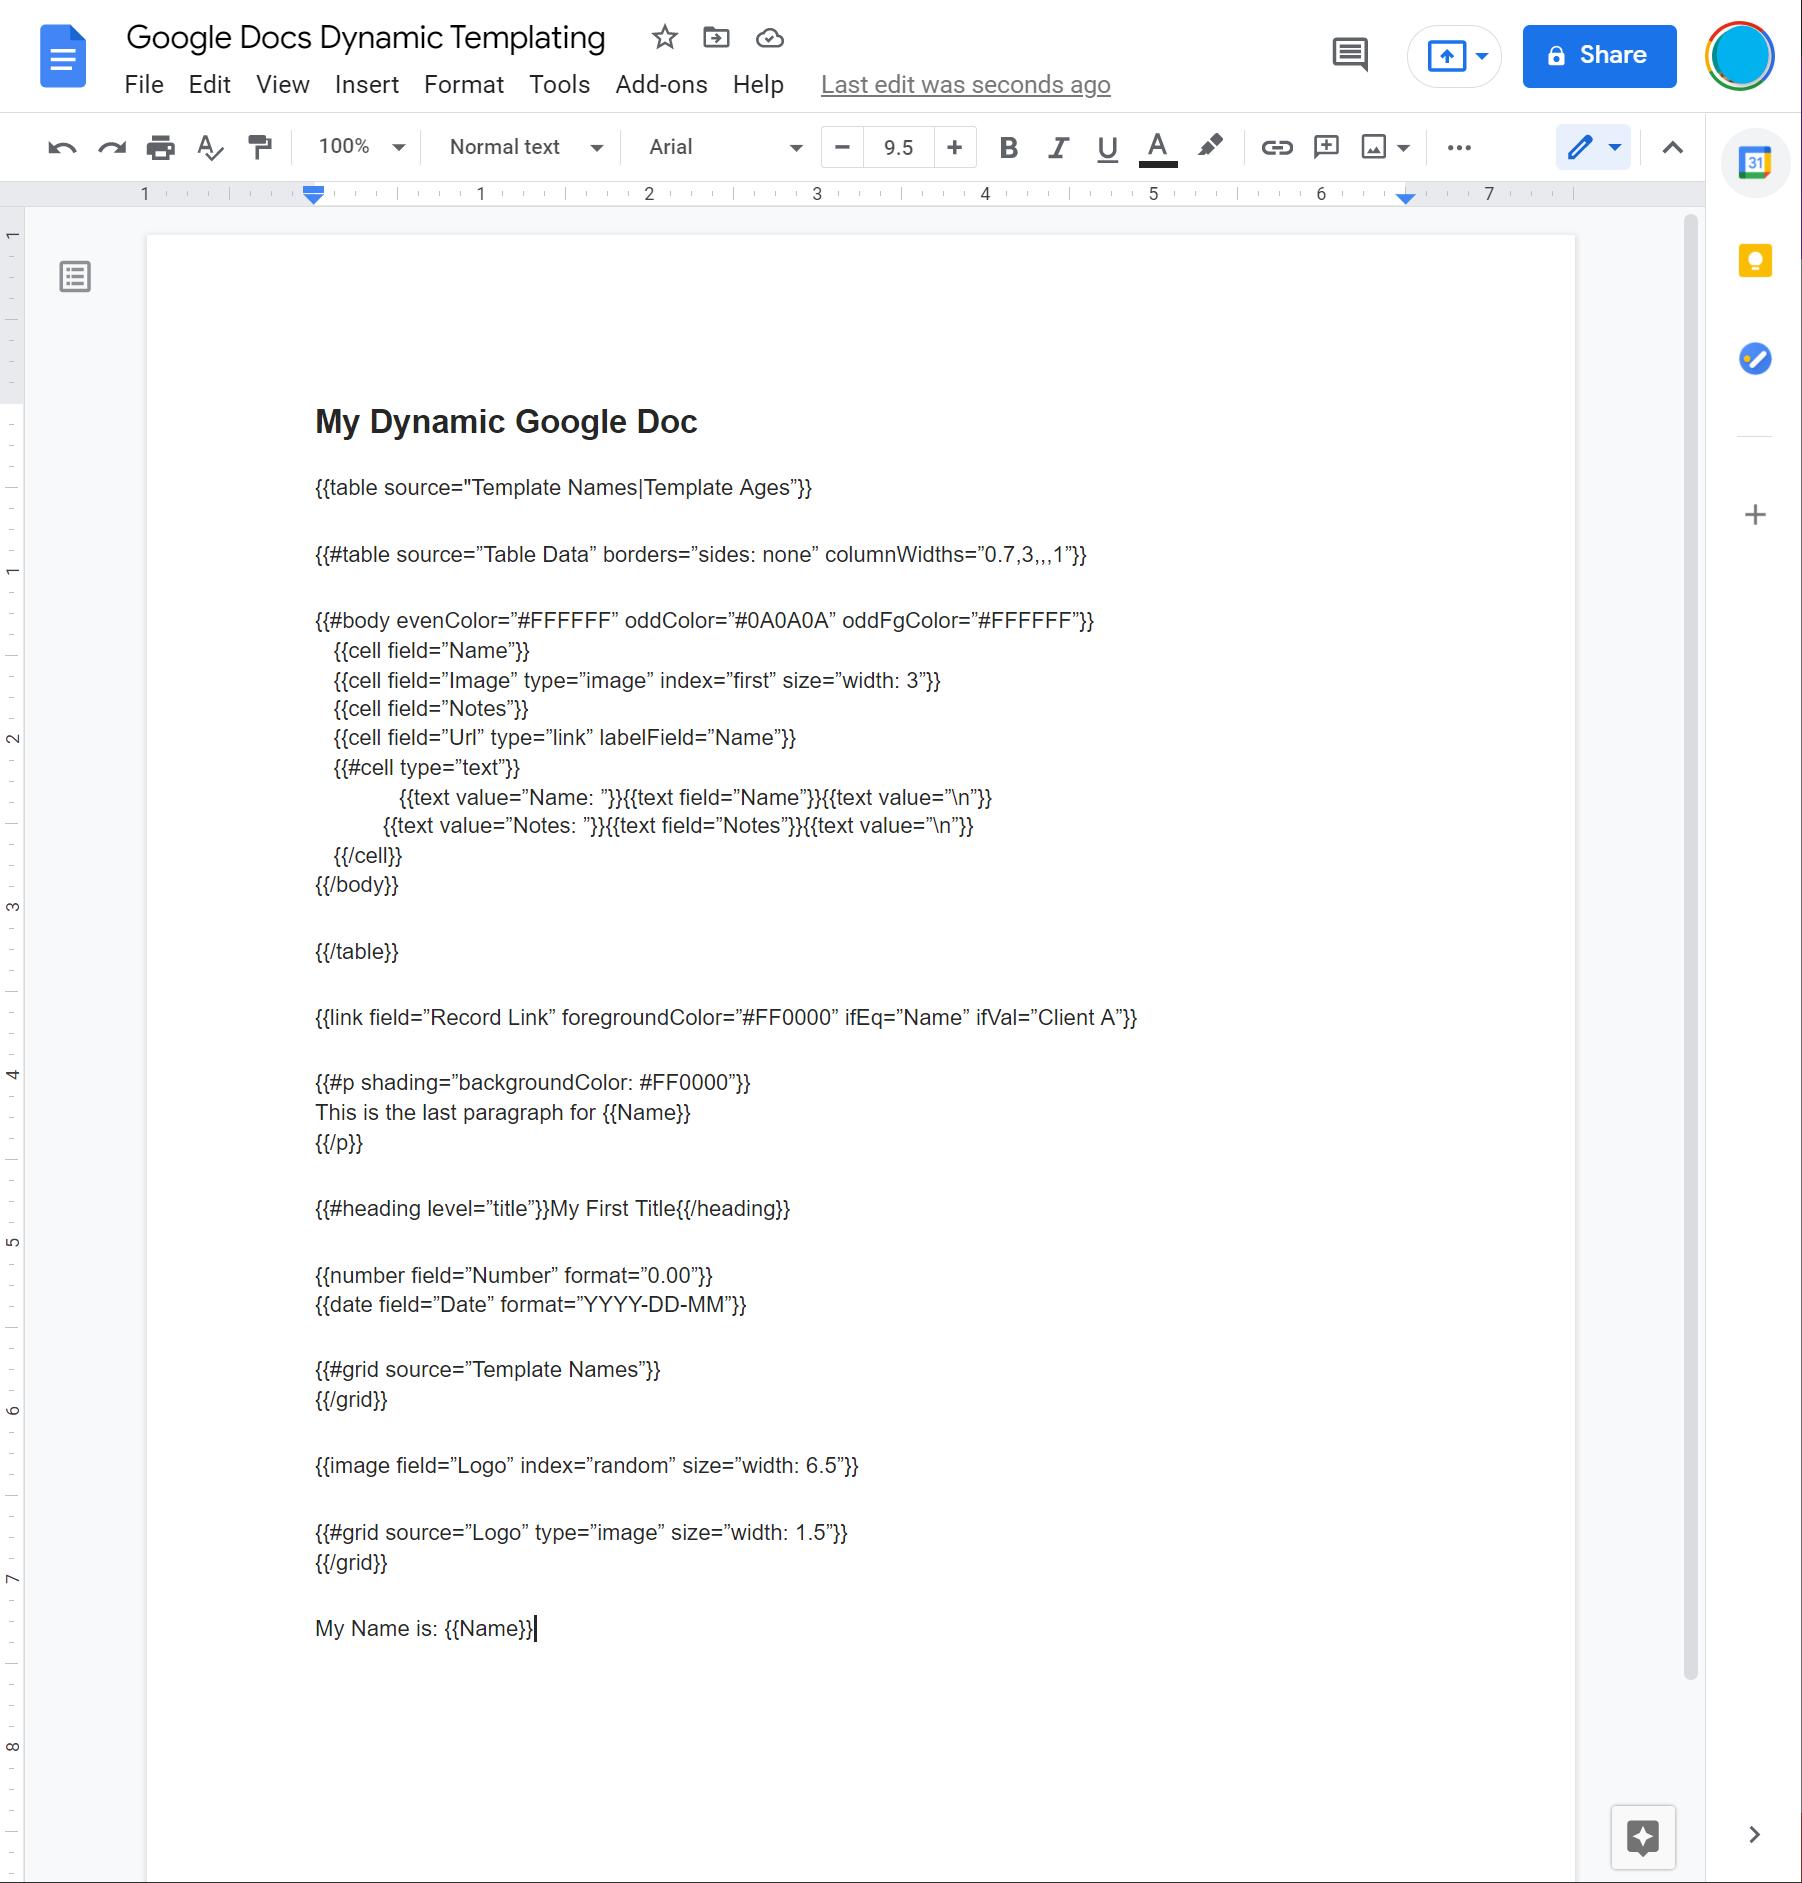 google docs - dynamic templating